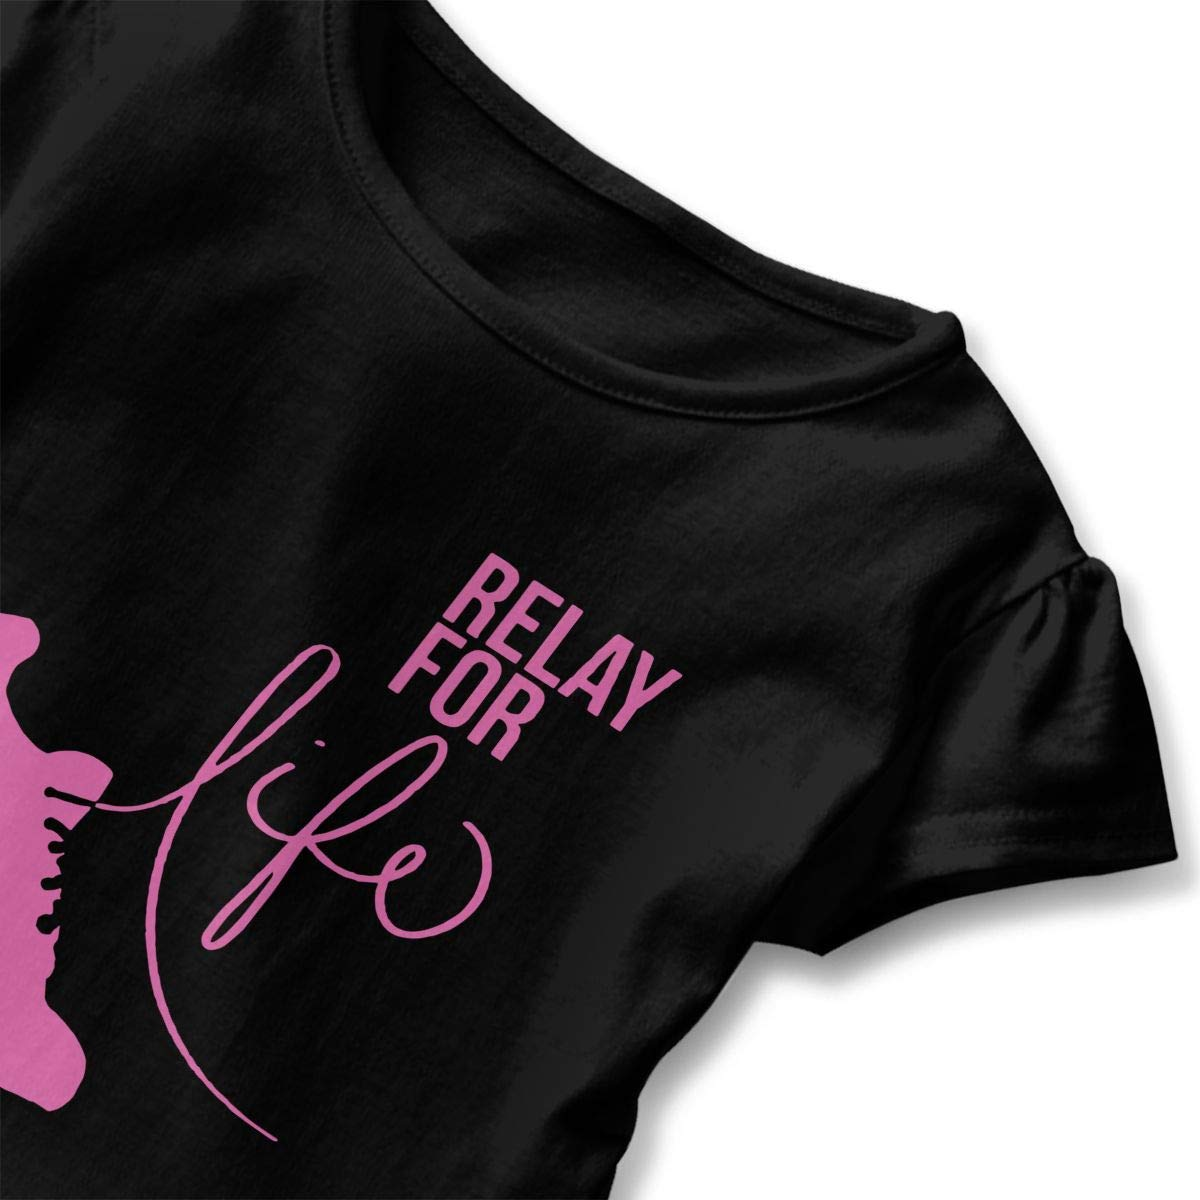 Ruffled Blouse Clothes with Flounces lu fangfangc Girls Short Sleeve Relay for Life Run Shirts 2-6T